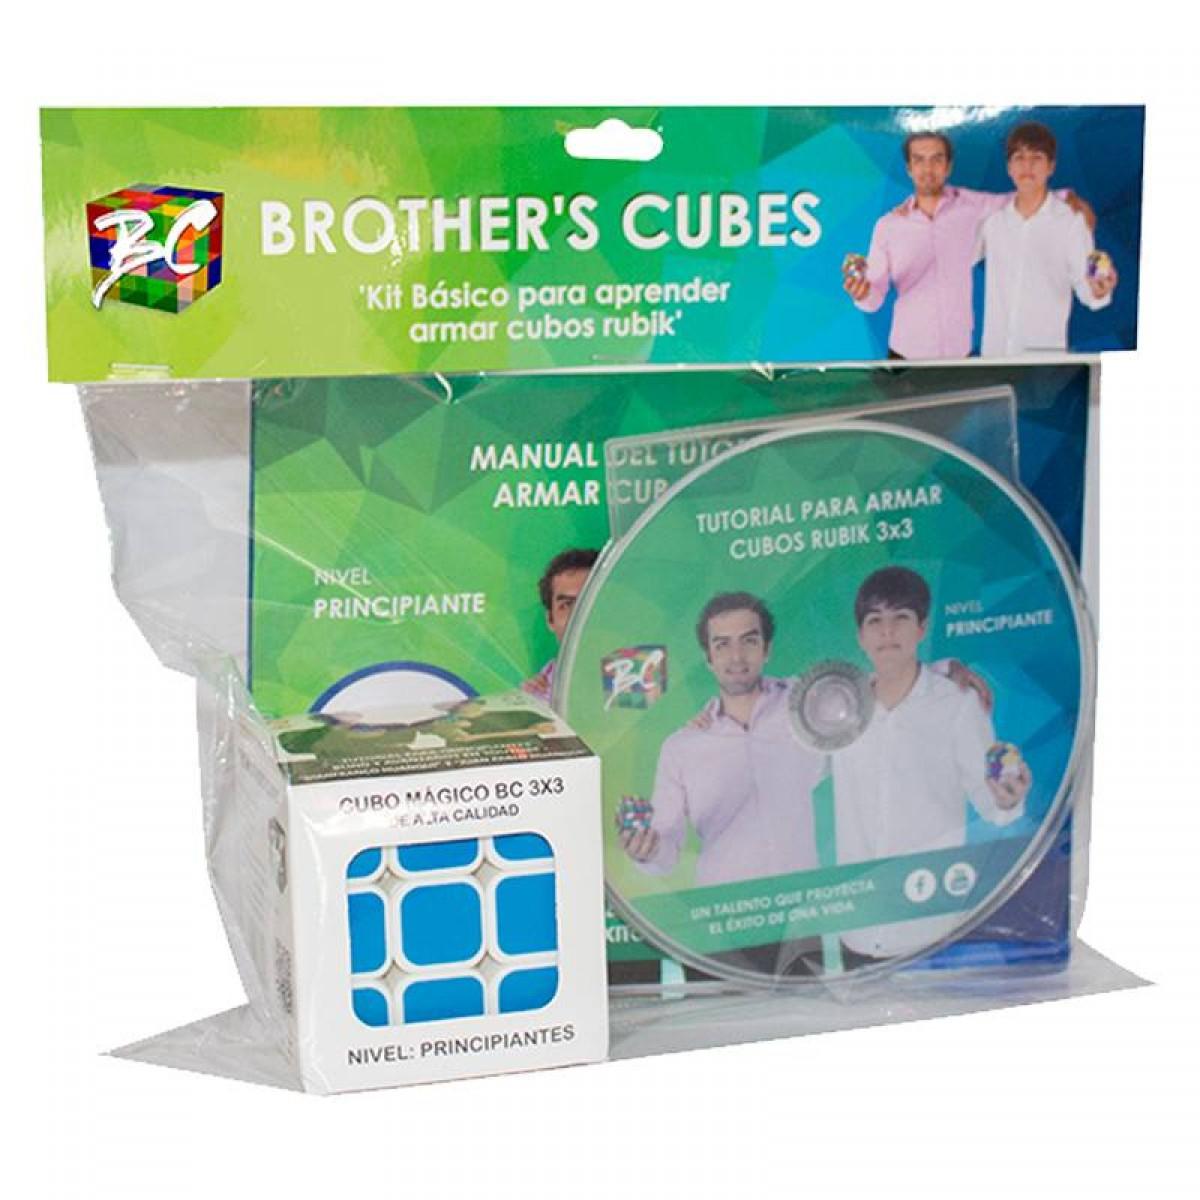 Cubo Rubik 3x3 Brothers Cubes